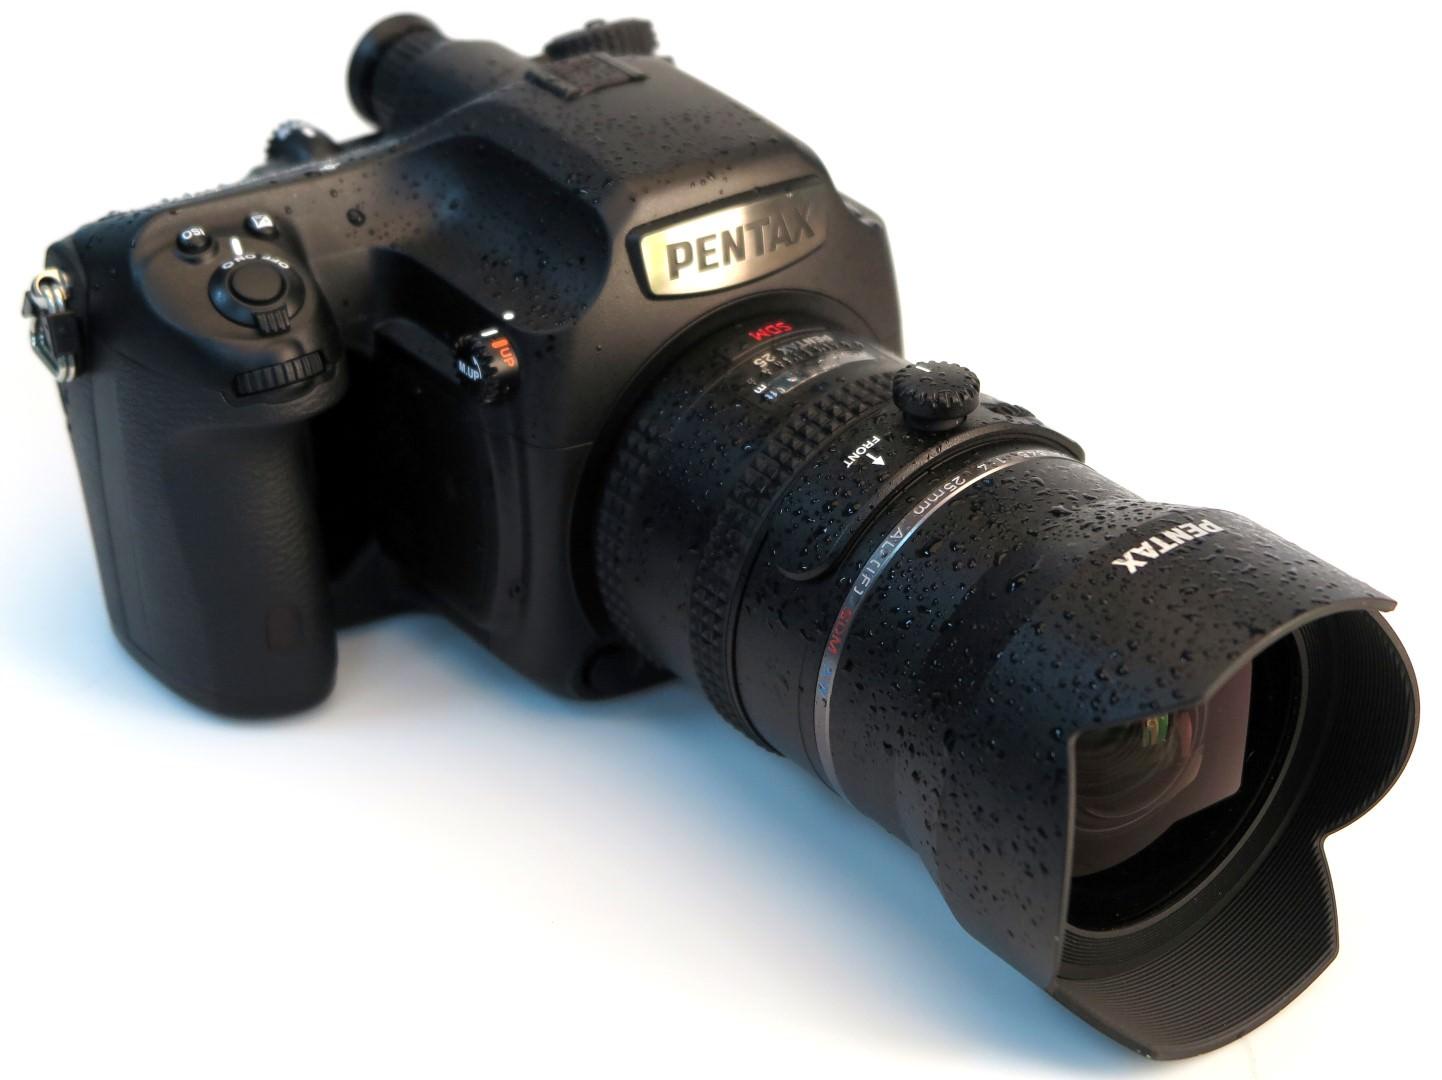 Camera Latest Pentax Dslr Camera pentax dslr camera